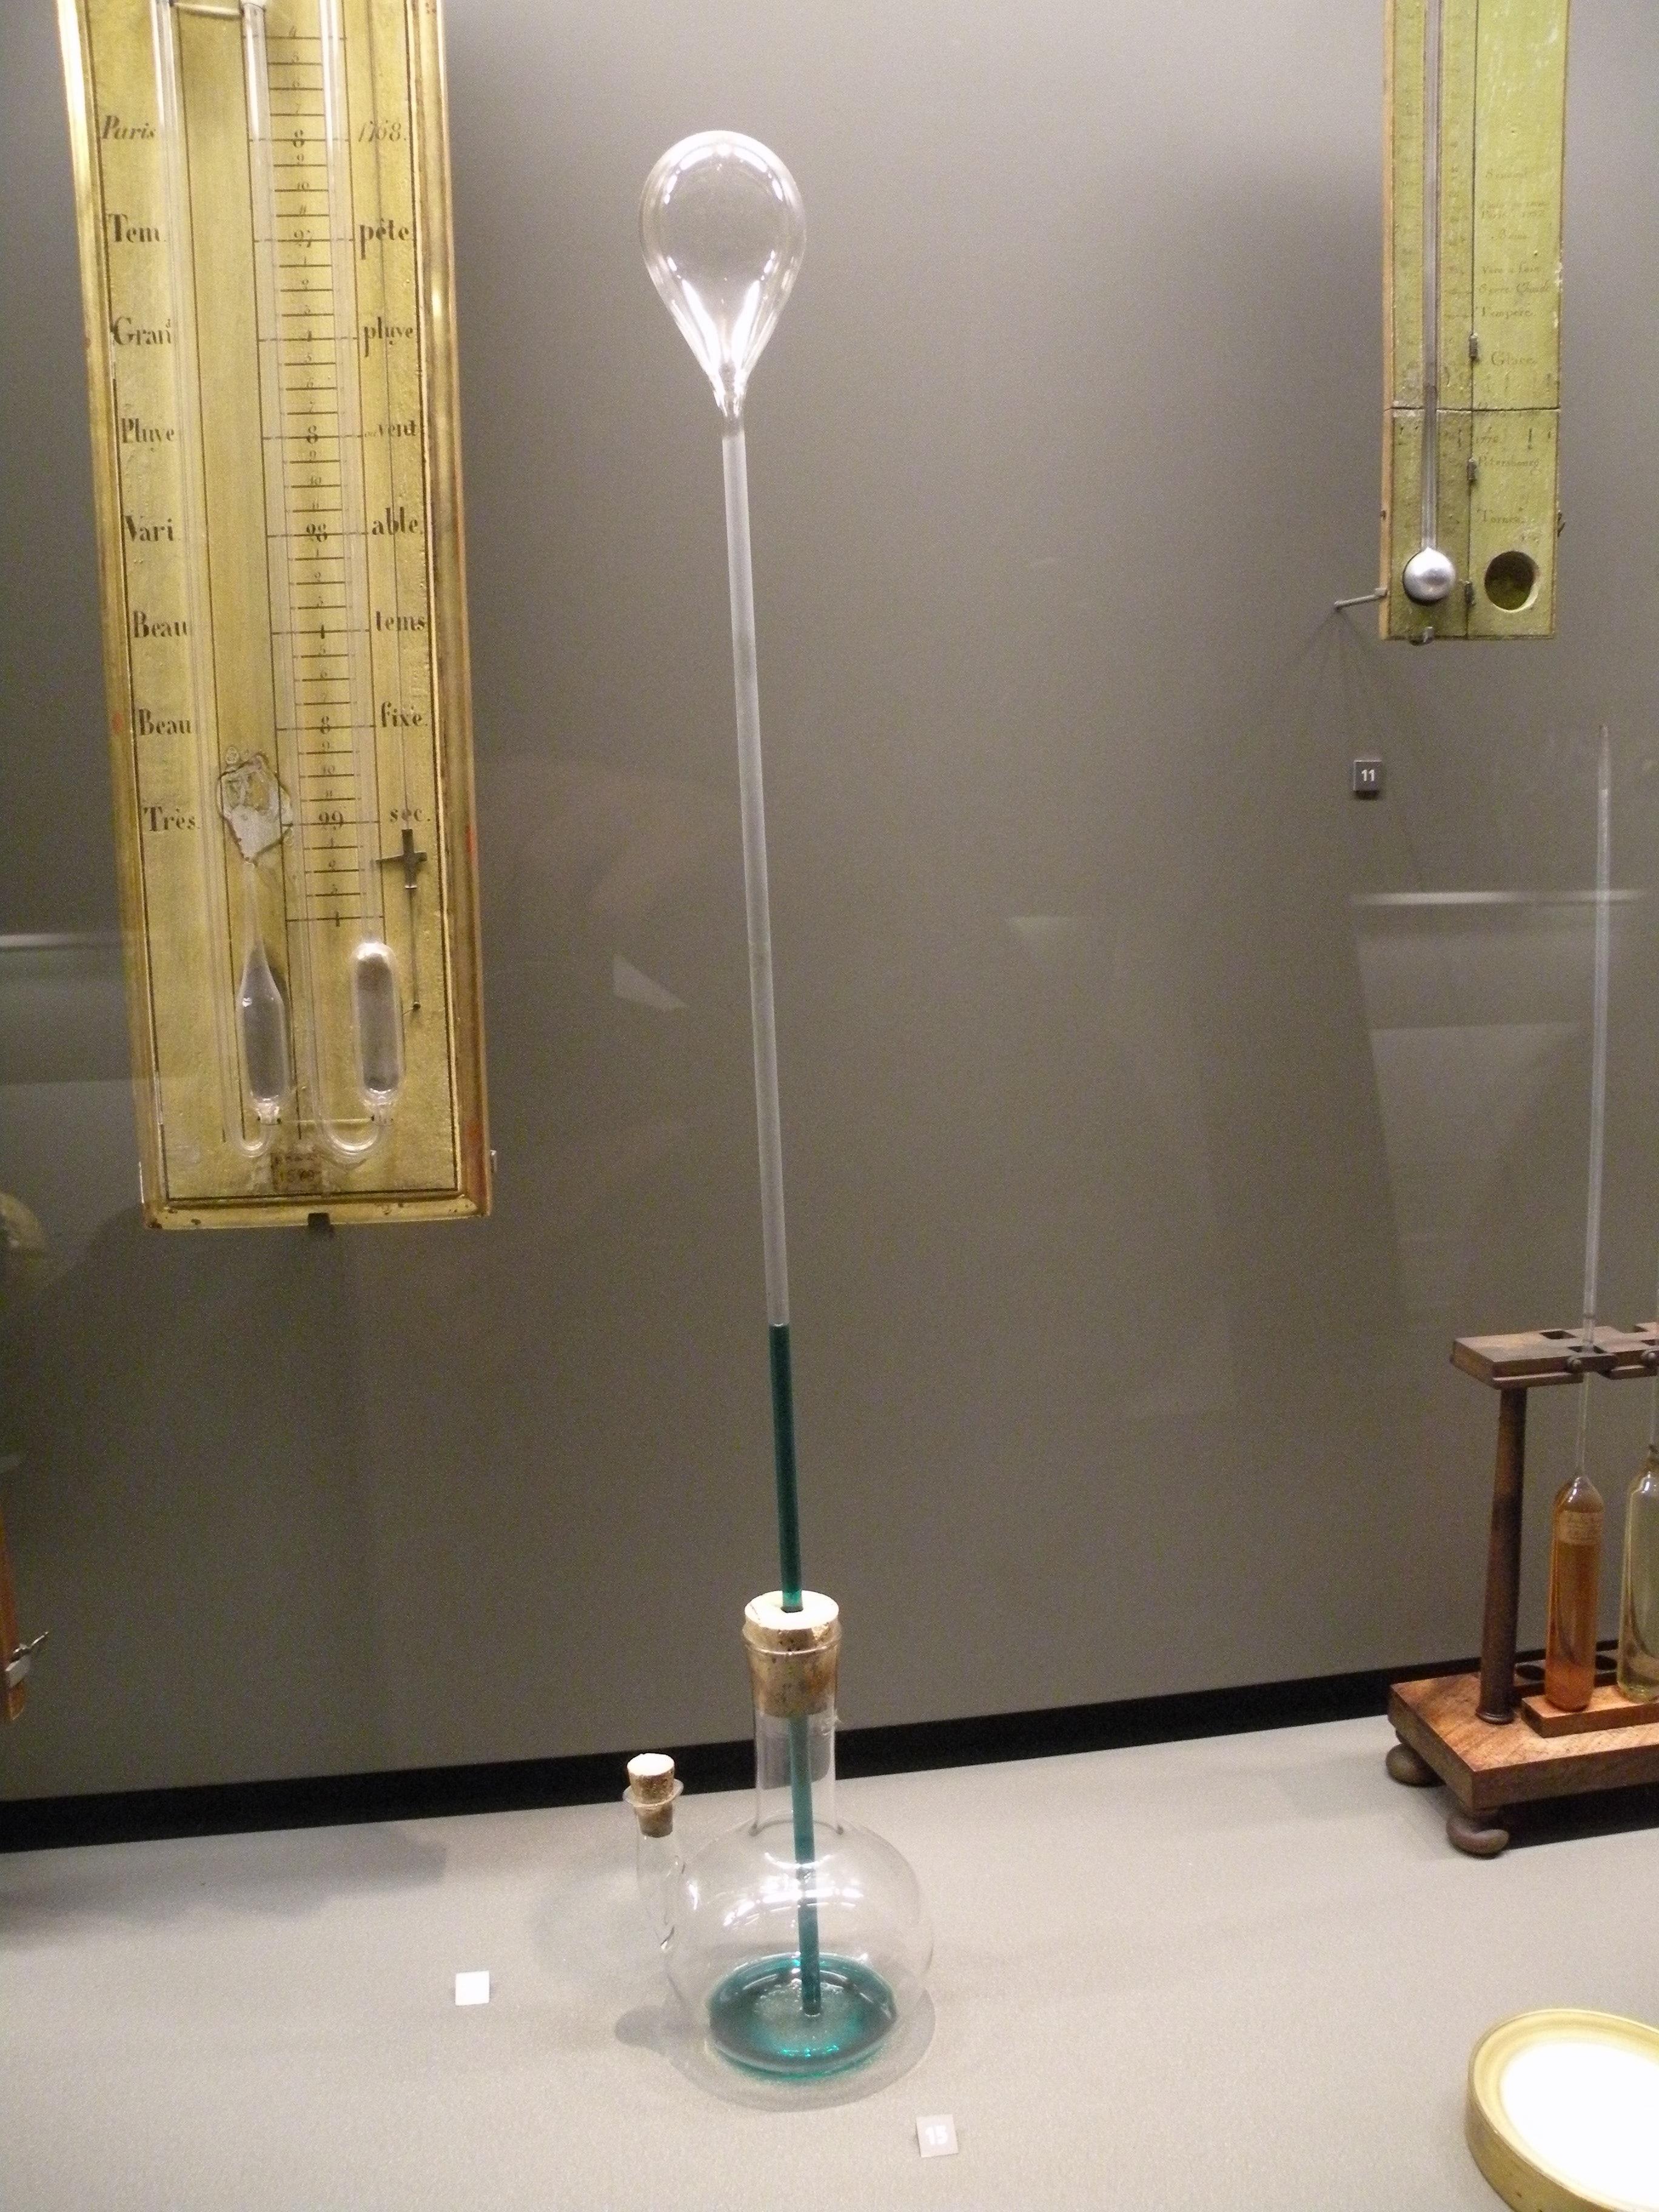 File:Musée des Arts et Métiers thermoscope de galilée 1592.JPG - Wikimedia  Commons